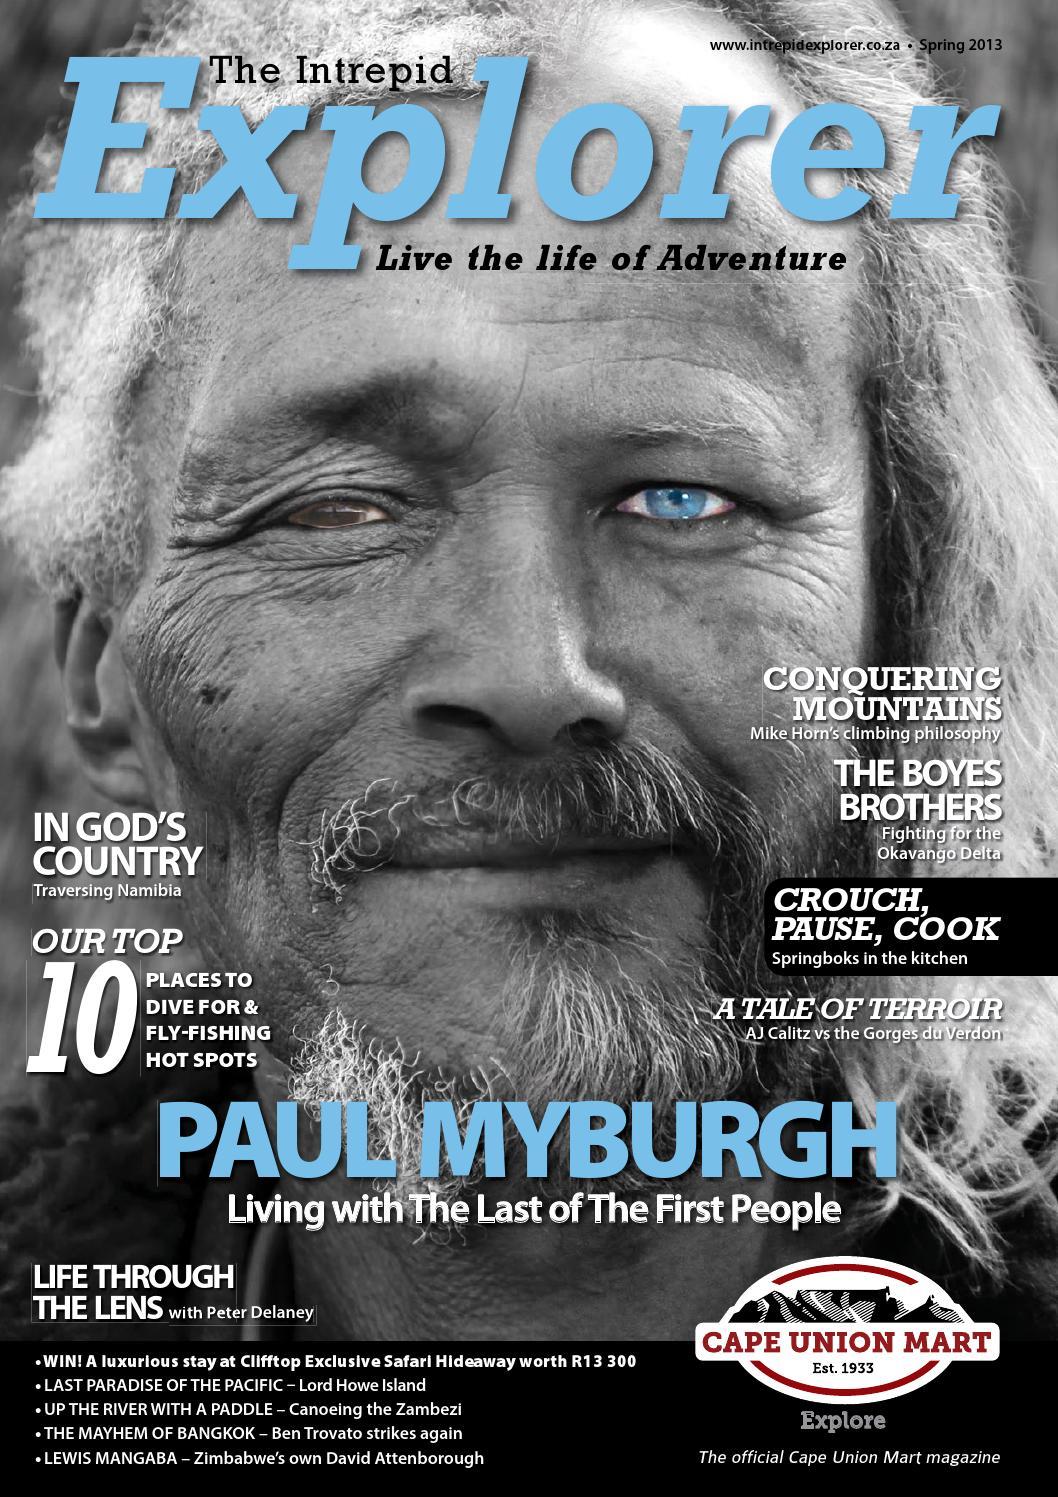 09f5c96adb6b The Intrepid Explorer magazine - Spring 2013 by The Intrepid Explorer -  issuu